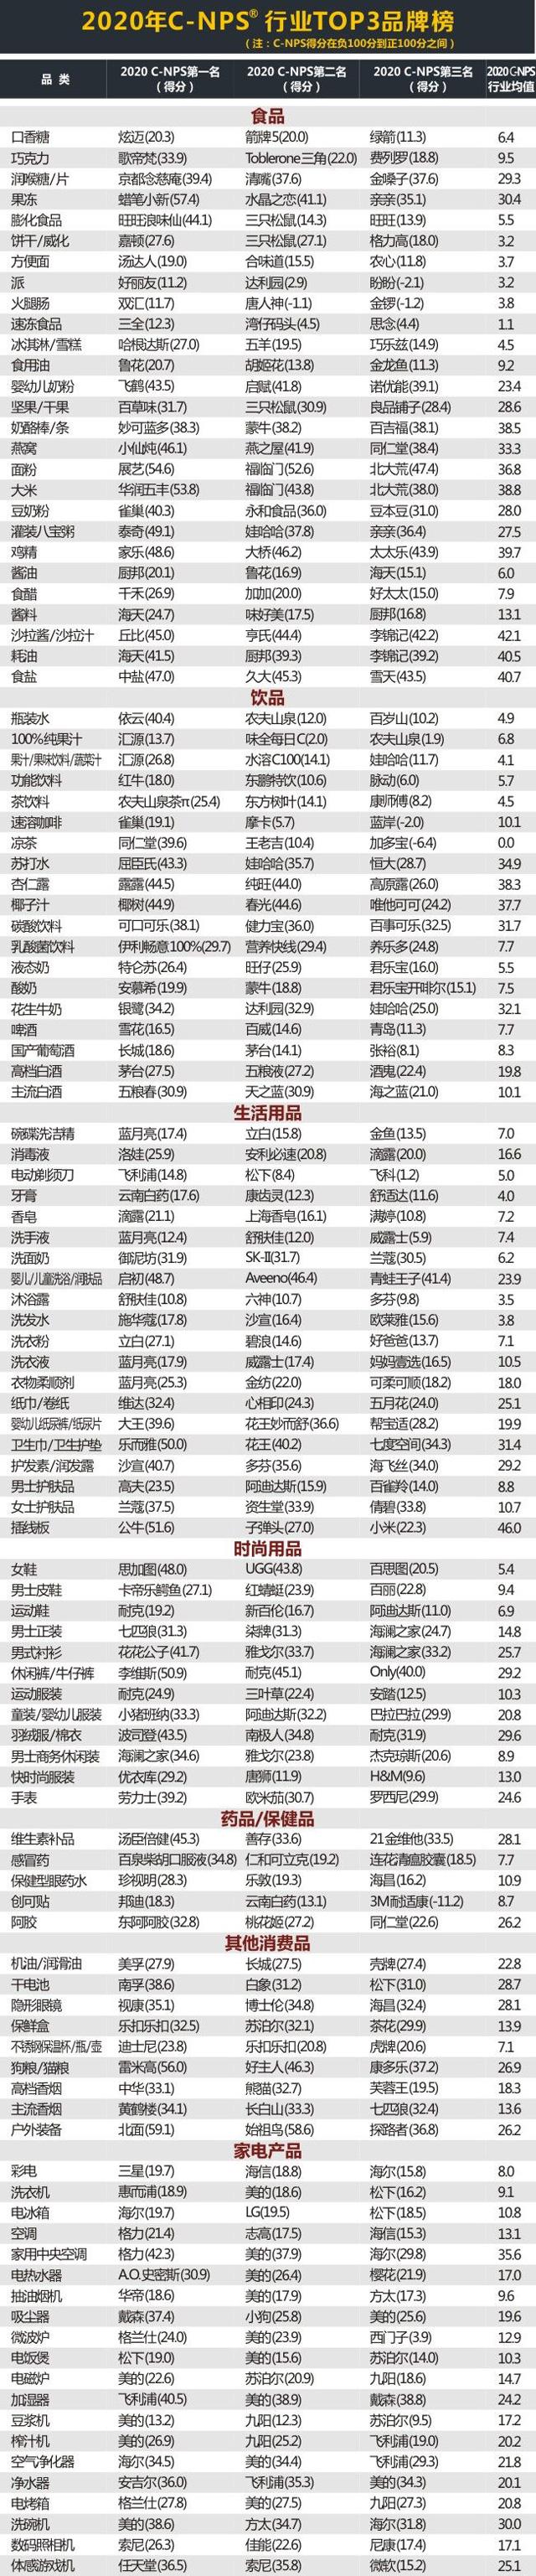 Chnbrand发布2020年中国顾客推荐度指数(C-NPS)